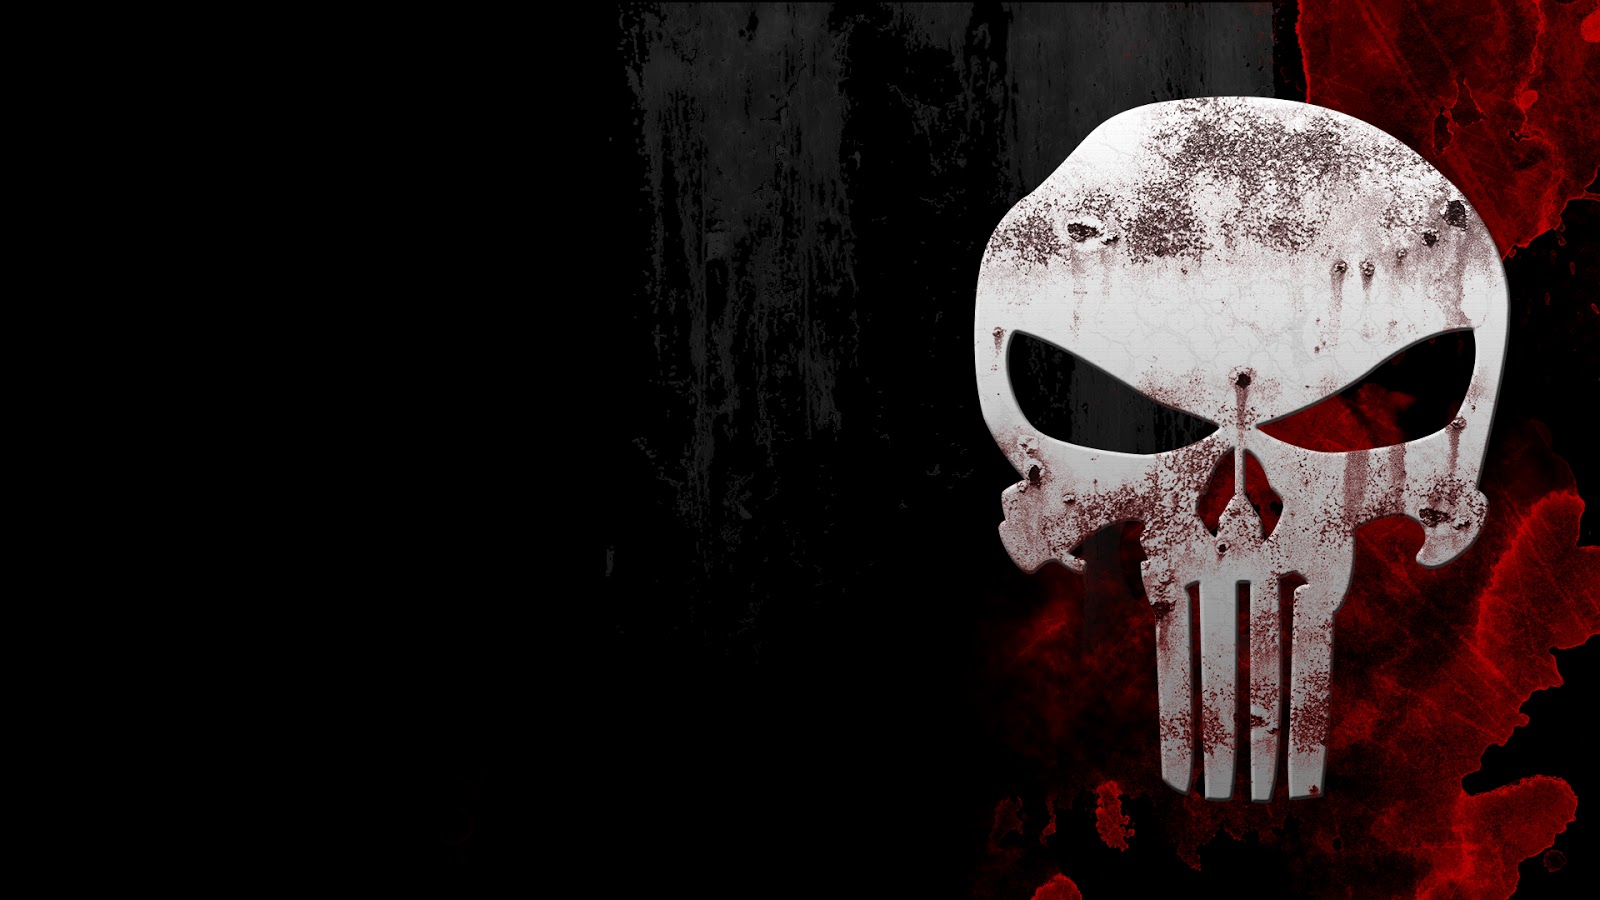 Punisher Comic Marvel Heroes Superhero Skull Logo Black Background HD Wallpaper Desktop PC A182